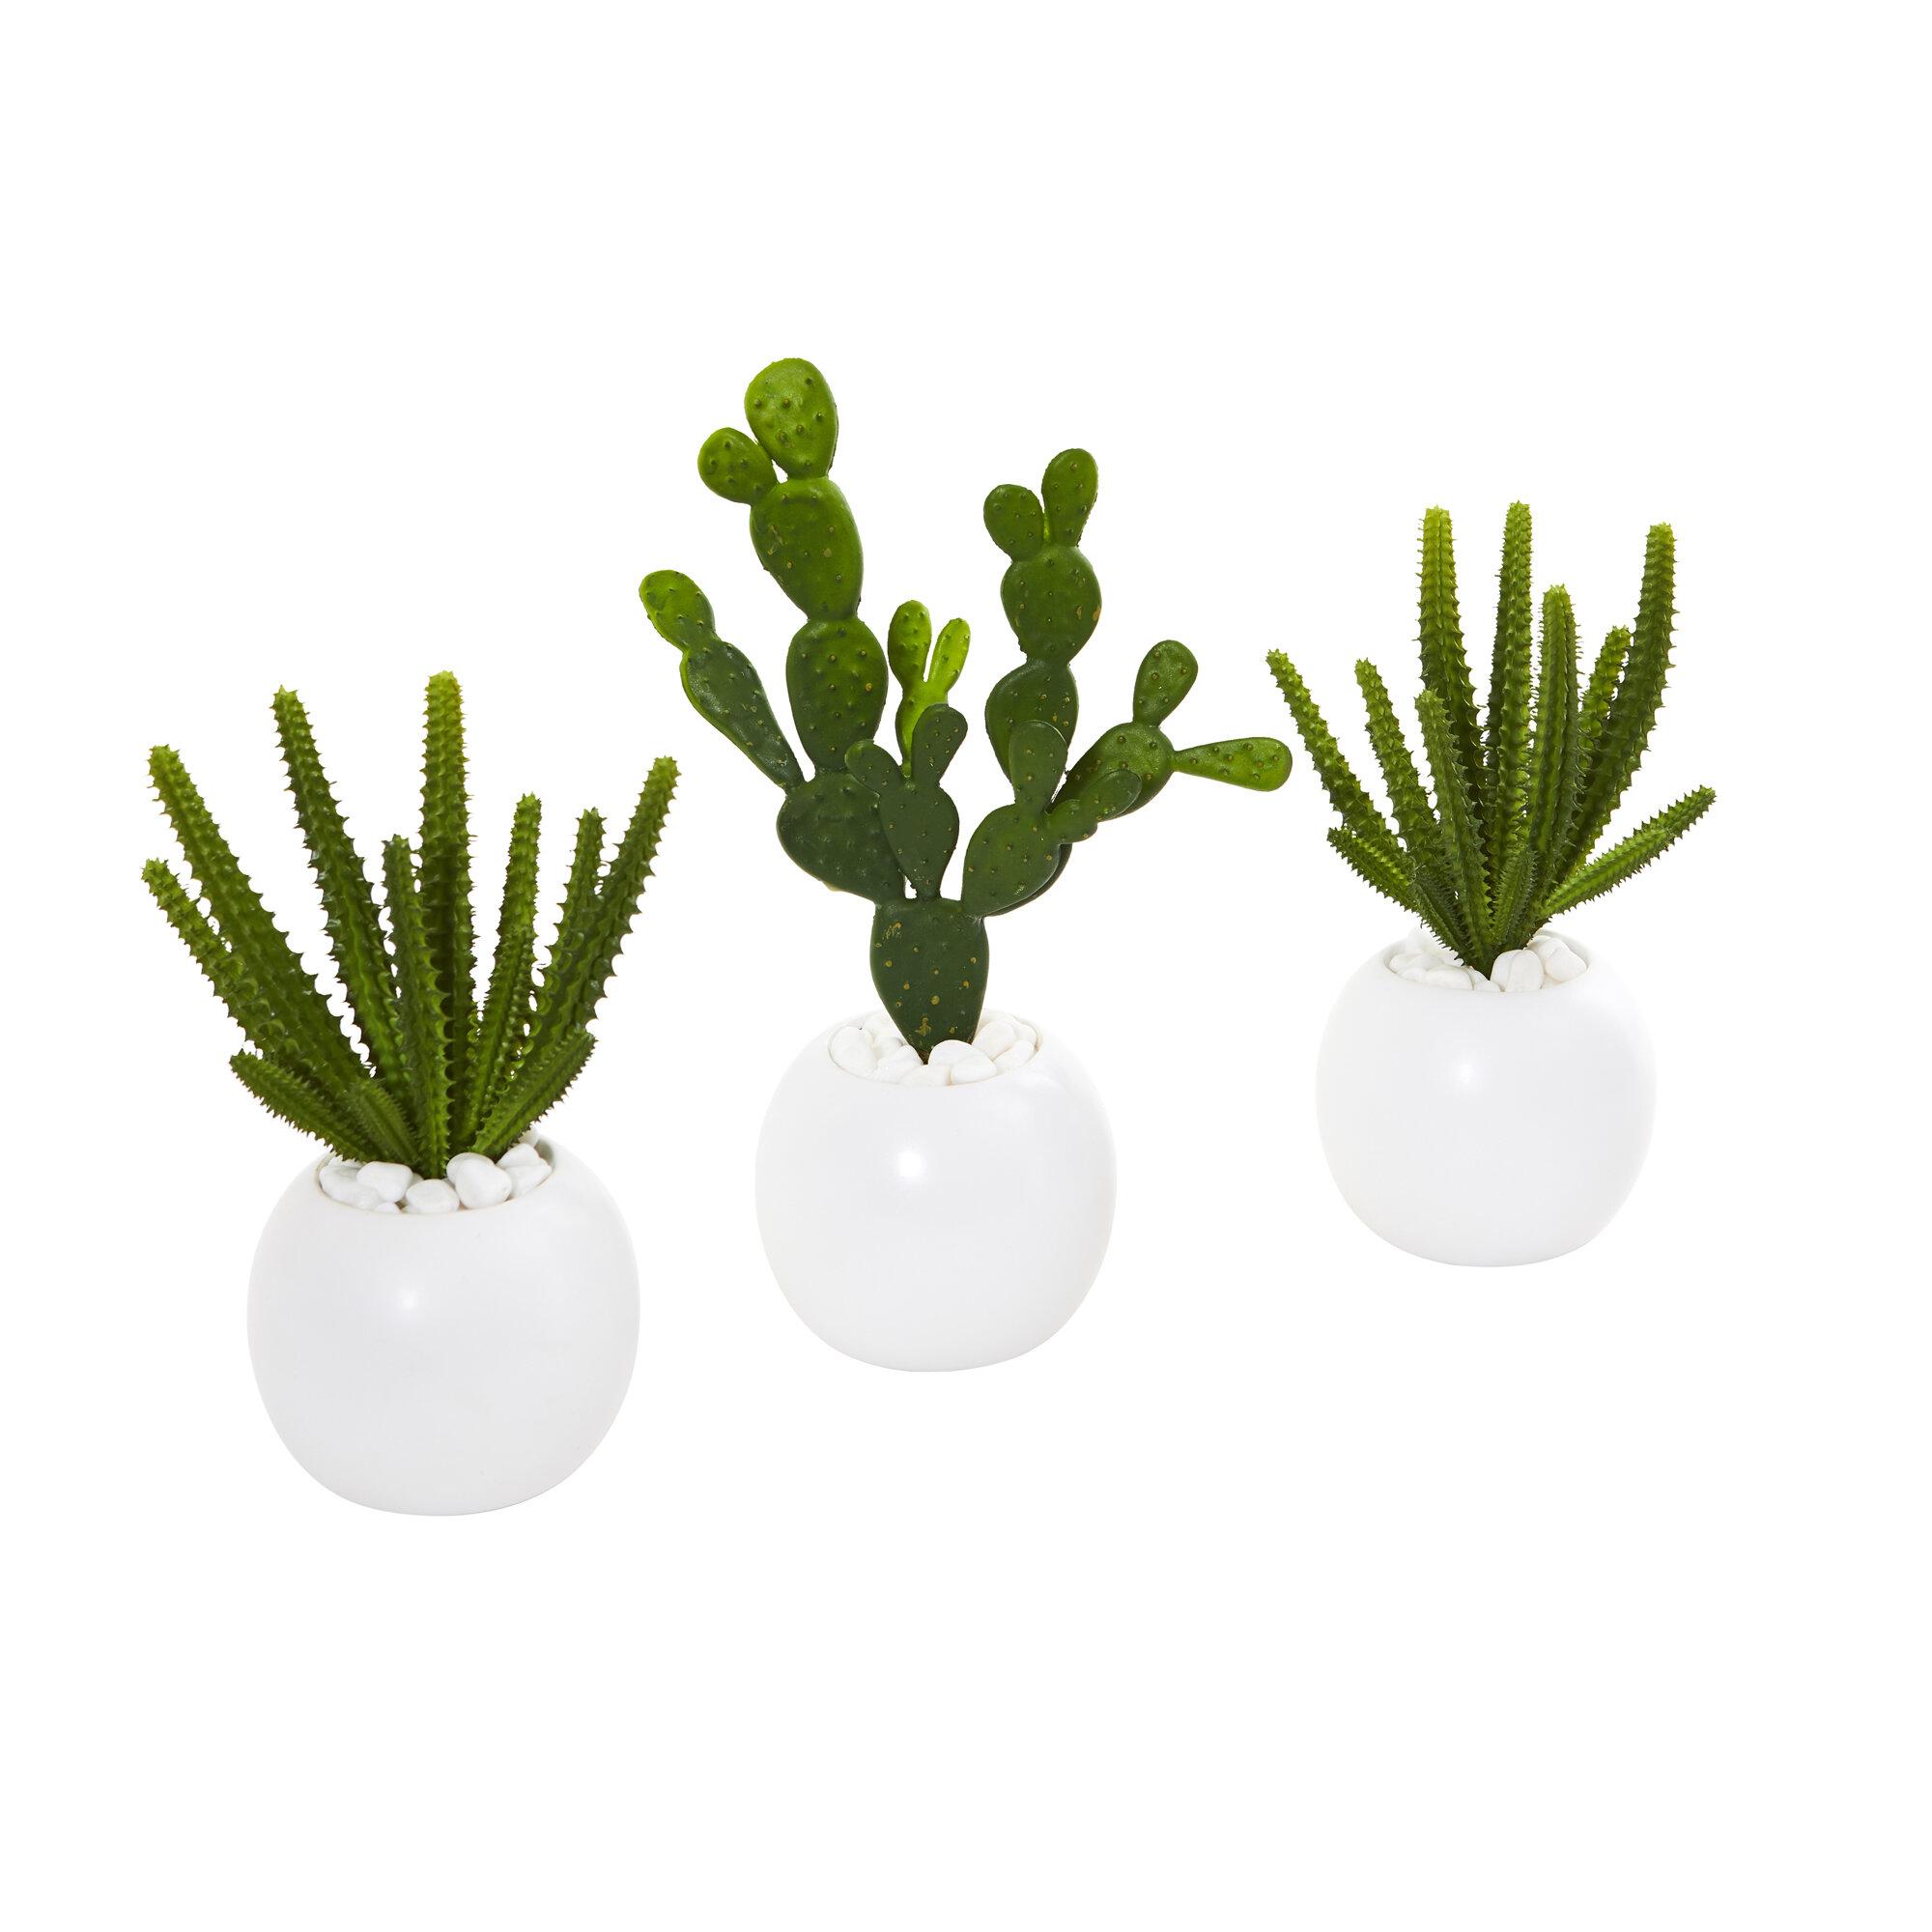 Primrue 3 Piece Artificial Cactus Plant In Decorative Vase Set Wayfair